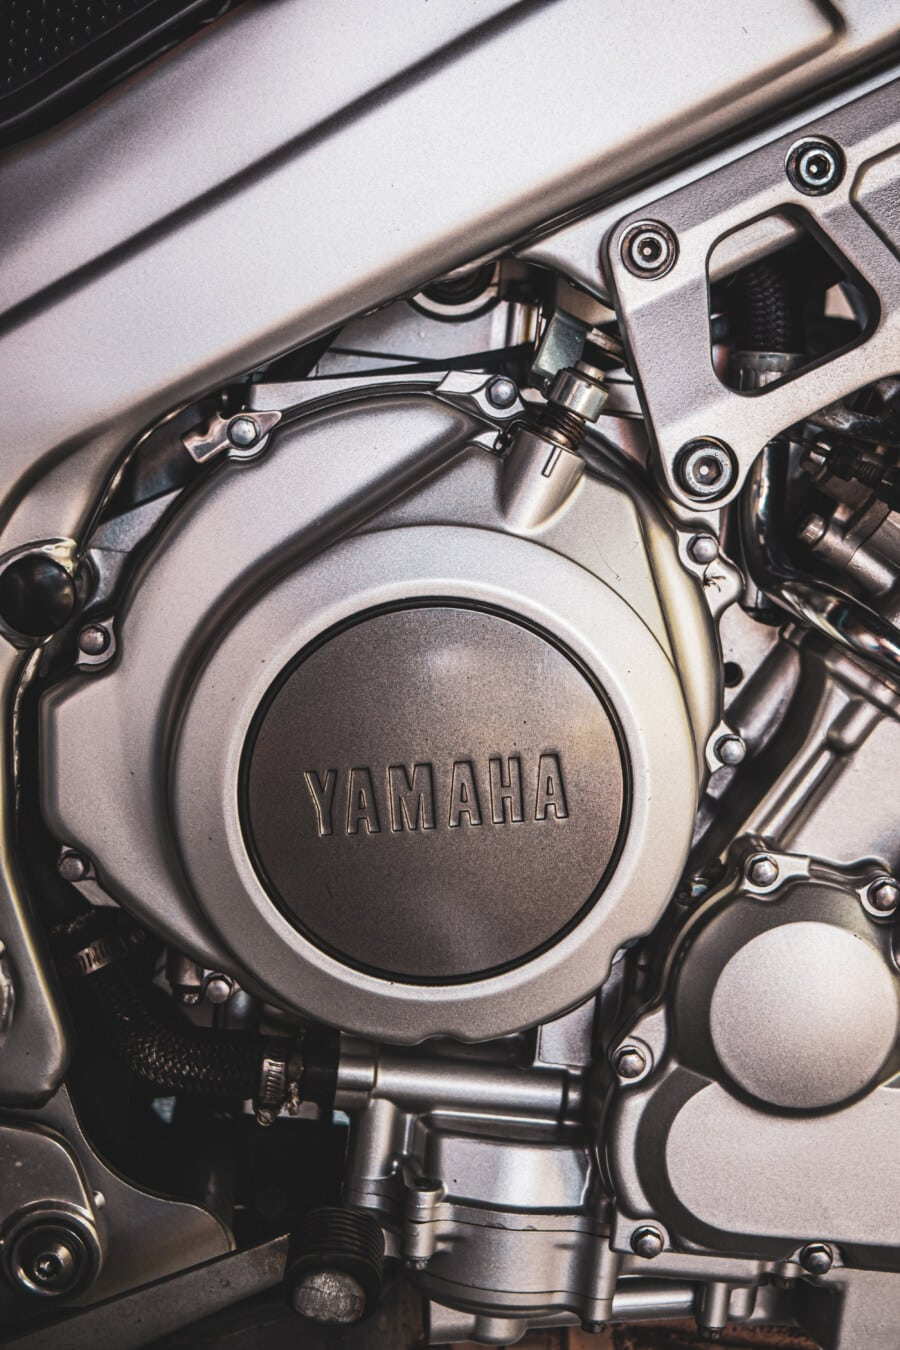 Yamaha, engine, parts, motorbike, stainless steel, metallic, chrome, technology, machinery, industry